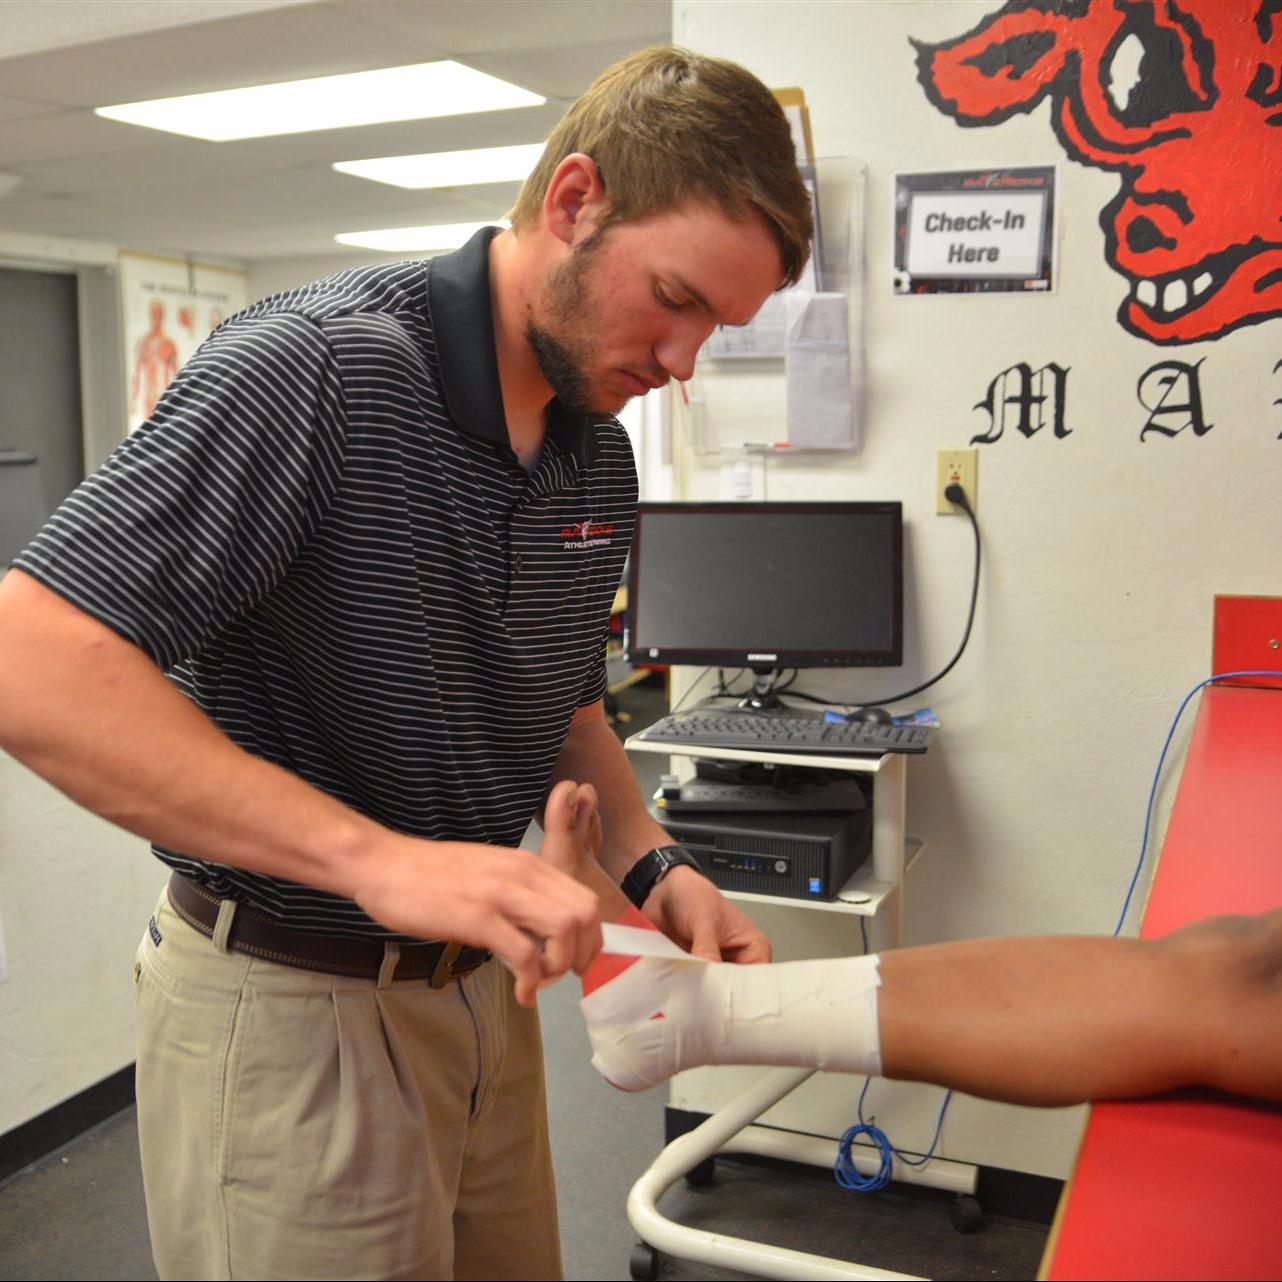 Paden Morris taping an ankle